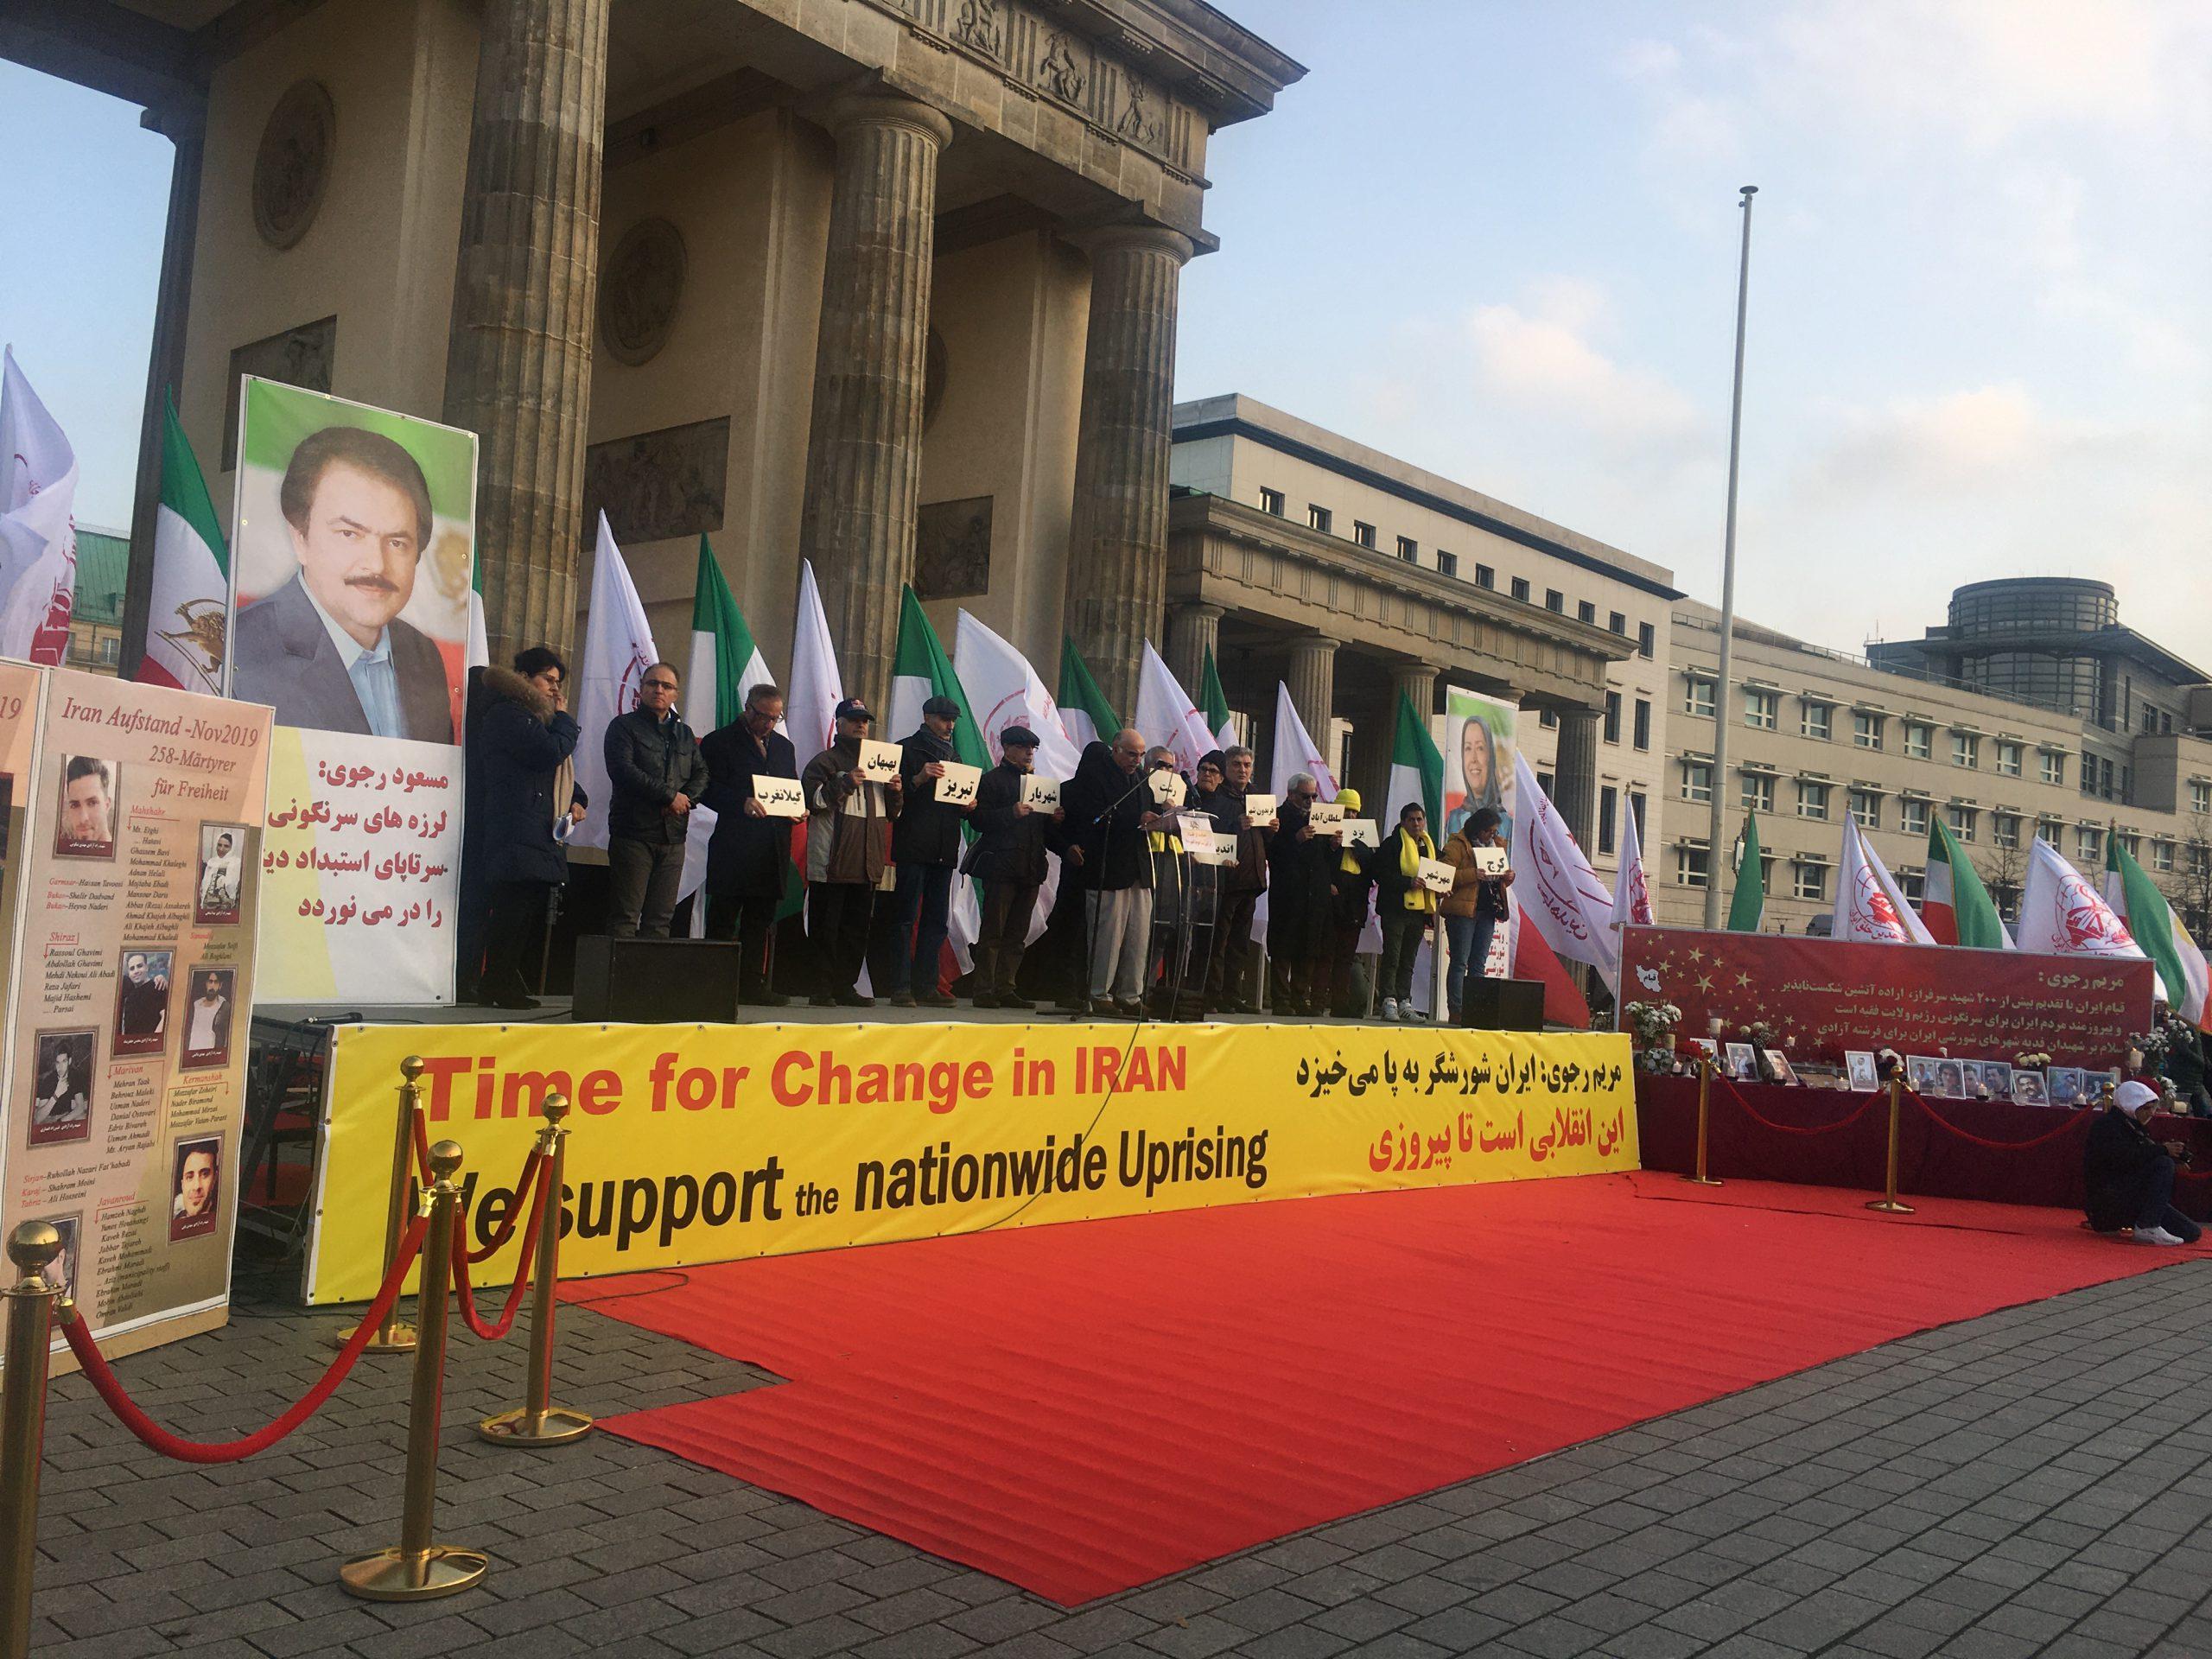 MEK rally in Berlin in solidarity with Iran Protests - November 23, 2019